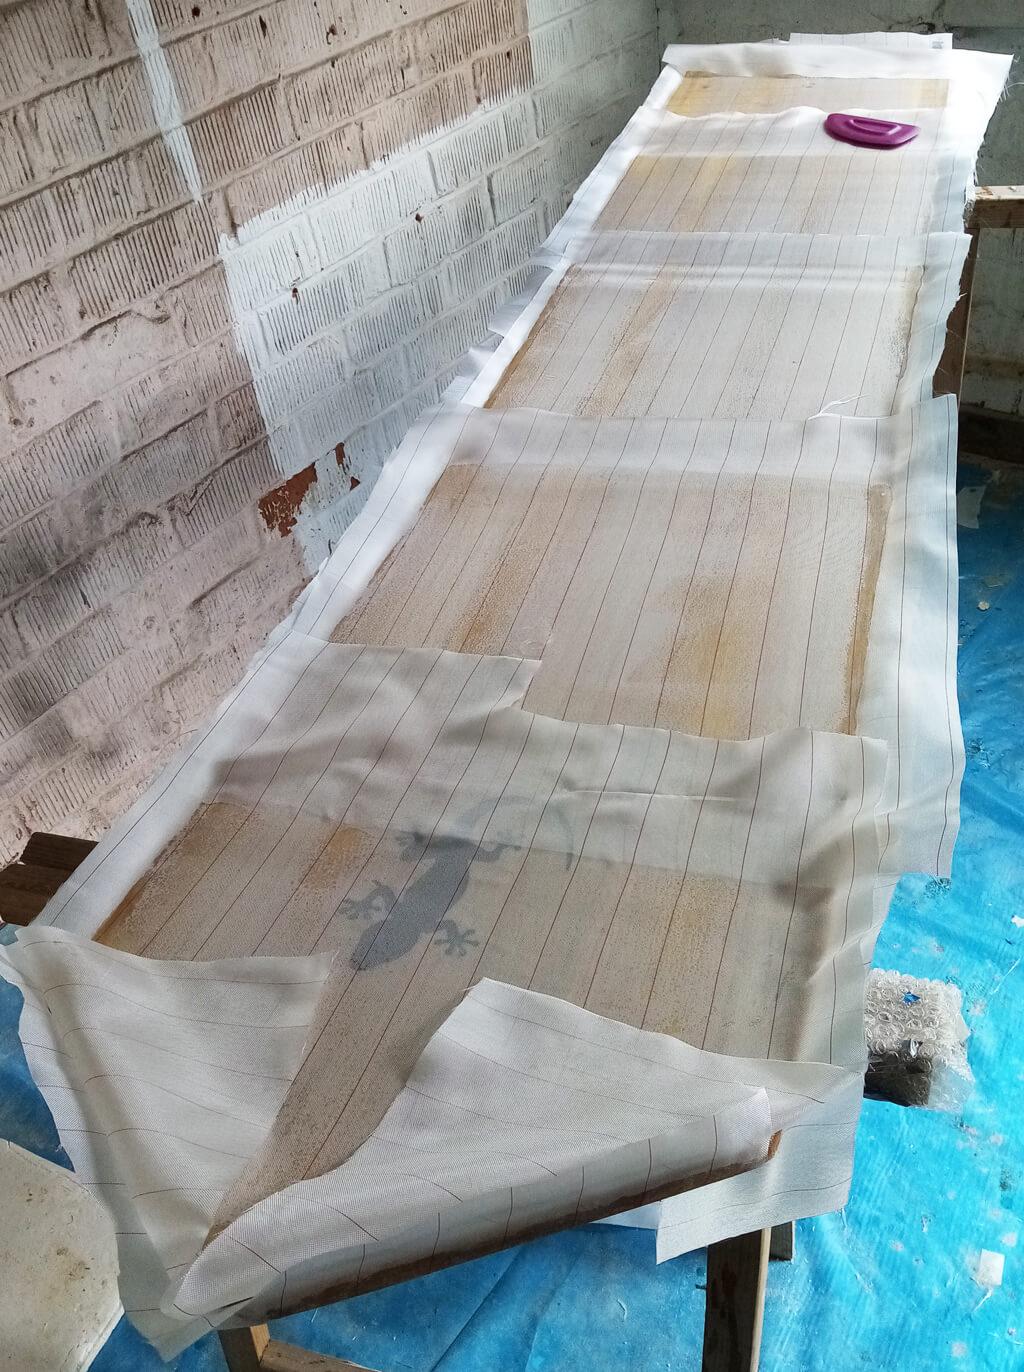 Tissu d'arrachage appliqué sur la fibre de verre